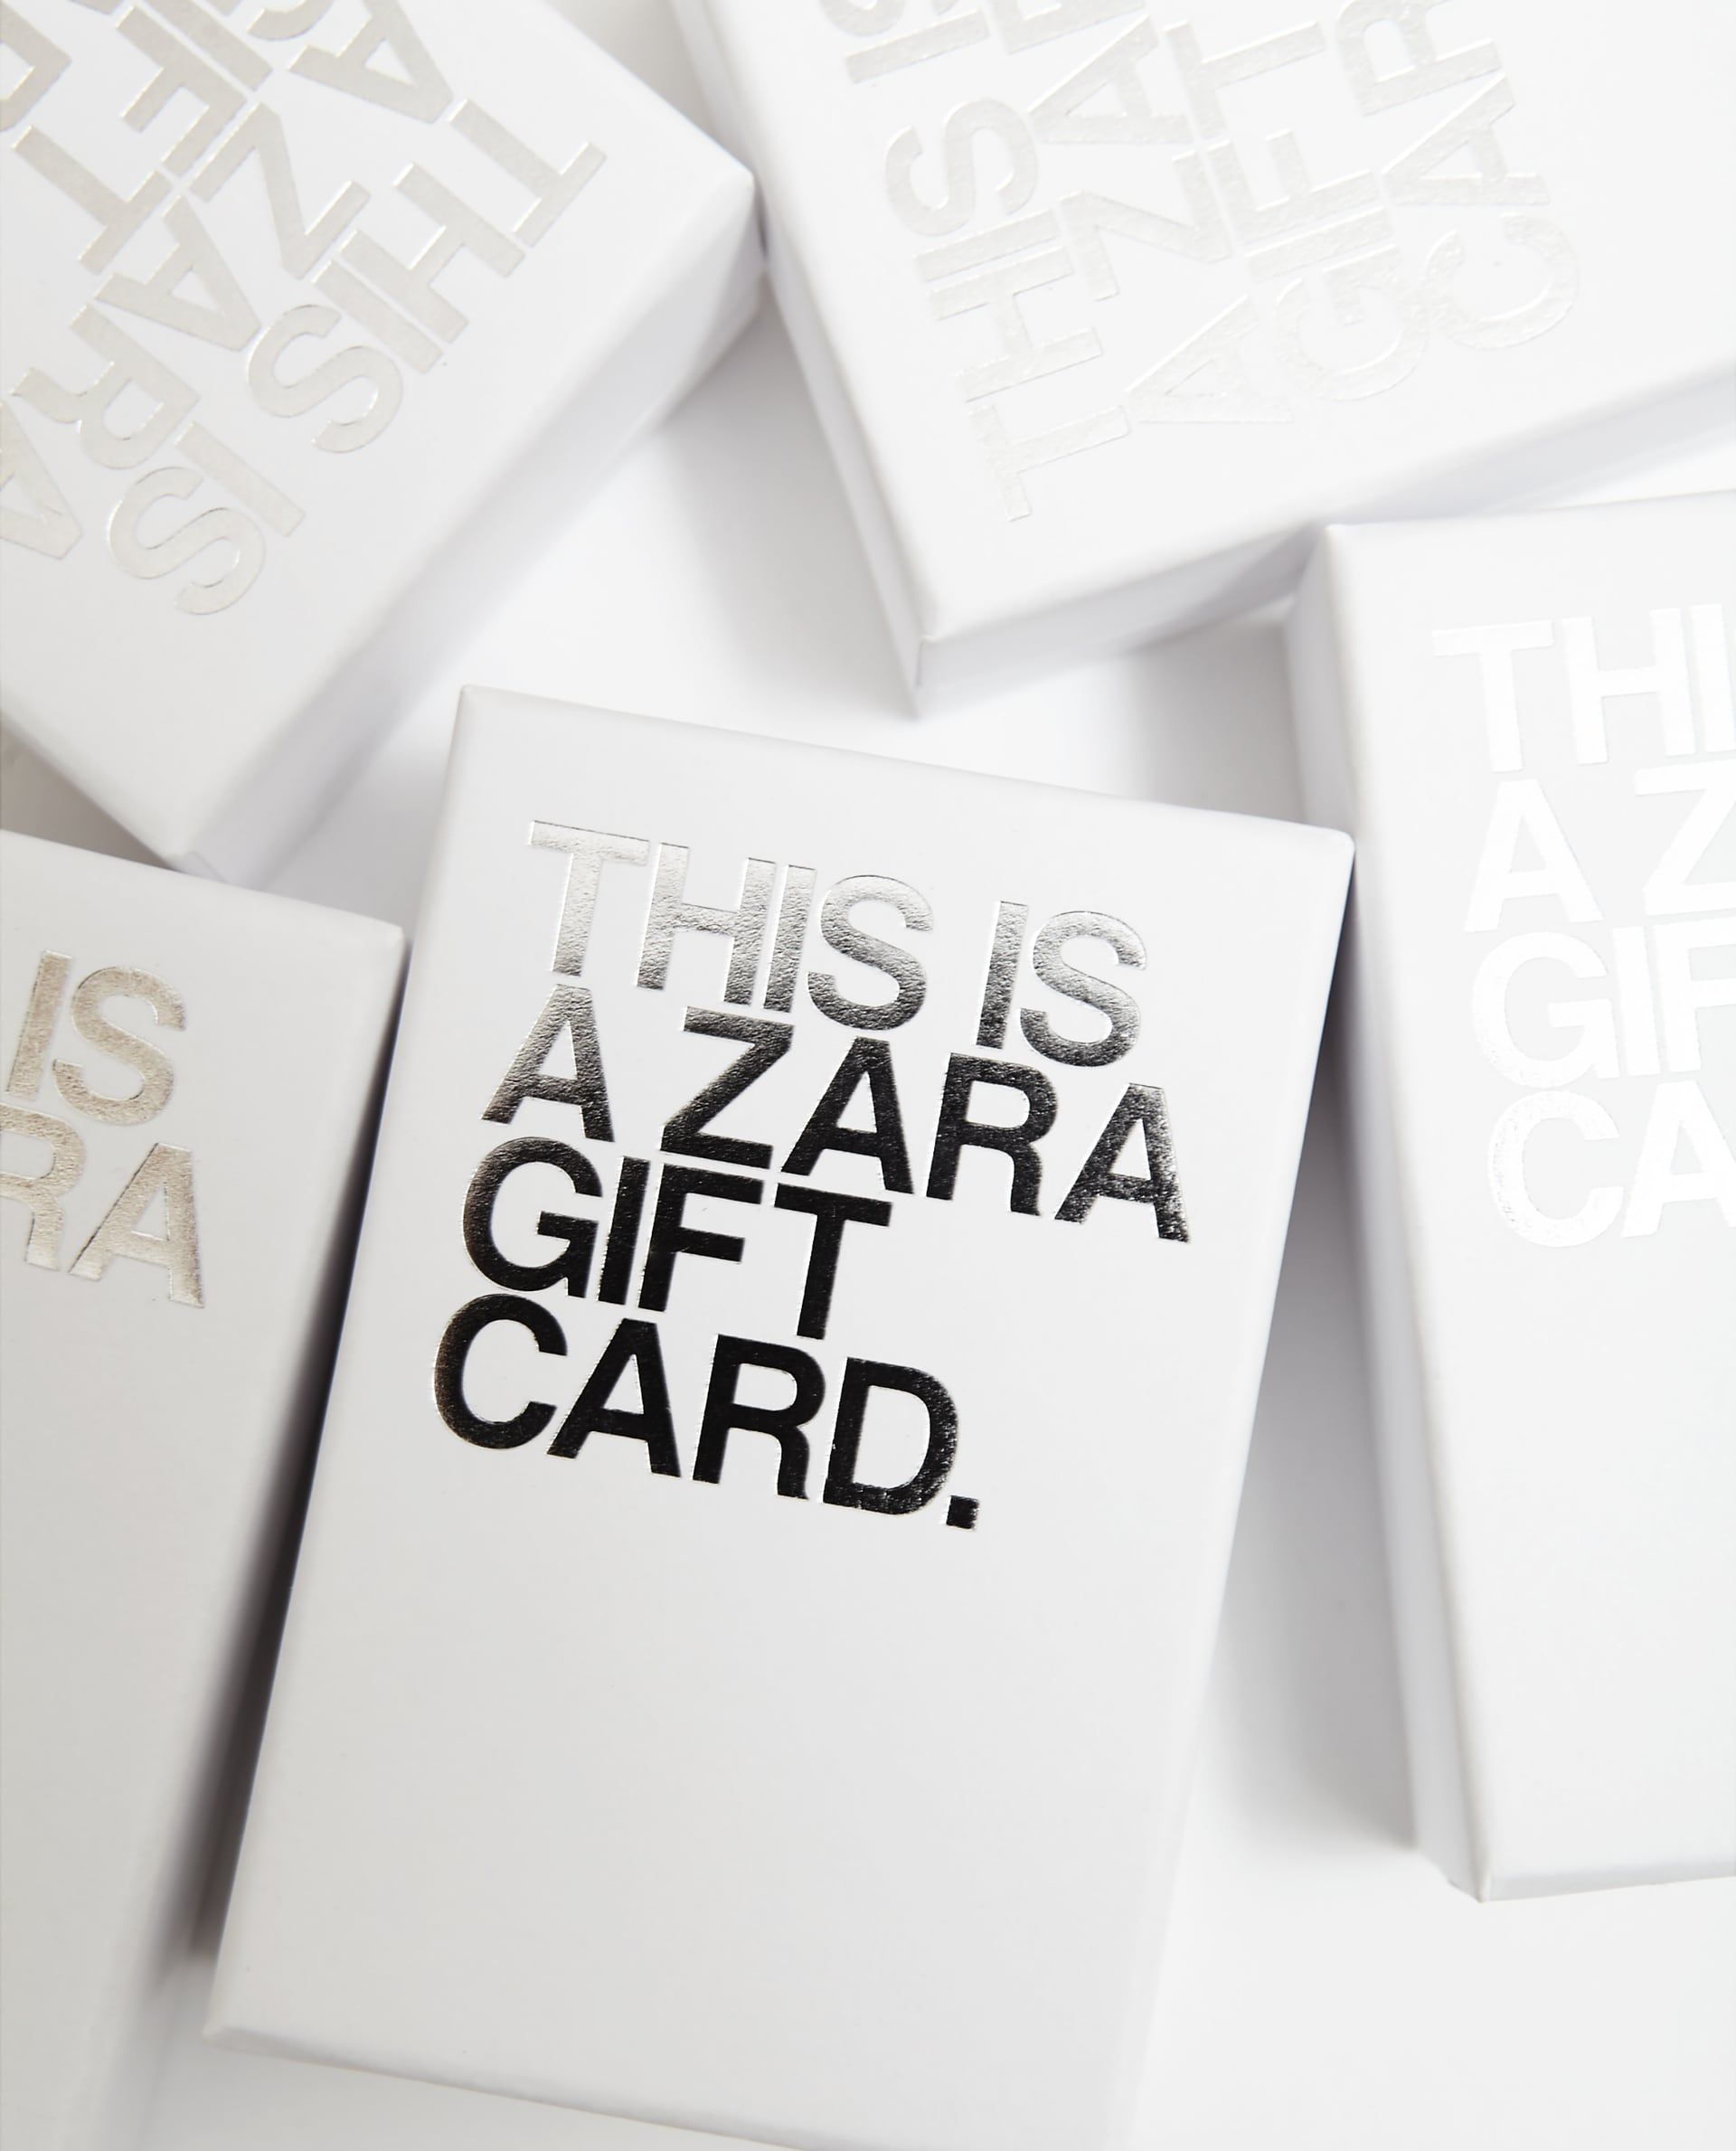 Pin by Romualdo Lat on gift card generator | Zara gifts ... Happy Gift Card Balance